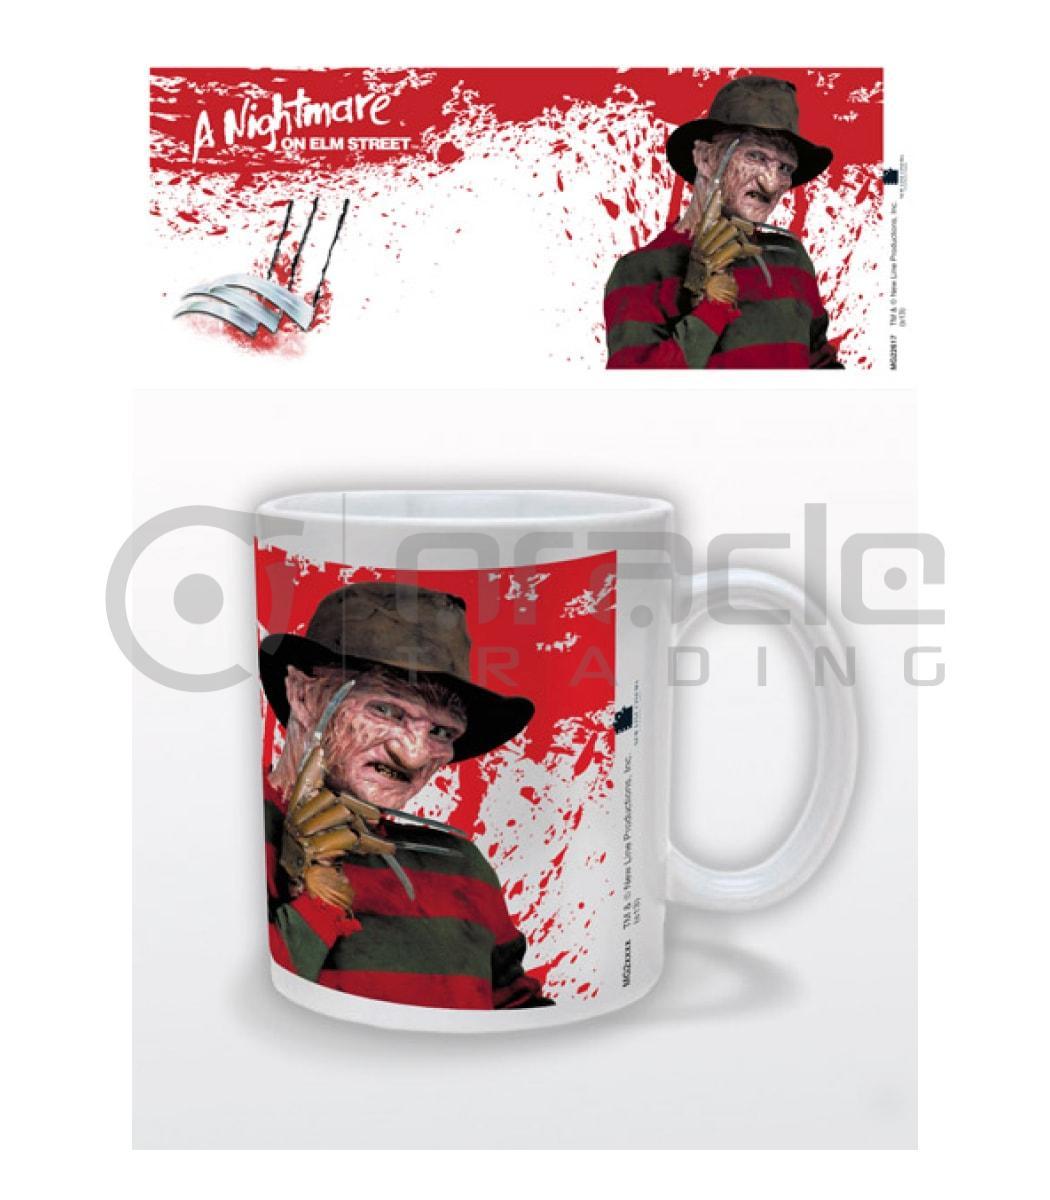 A Nightmare On Elm Street Mug - Freddy Krueger